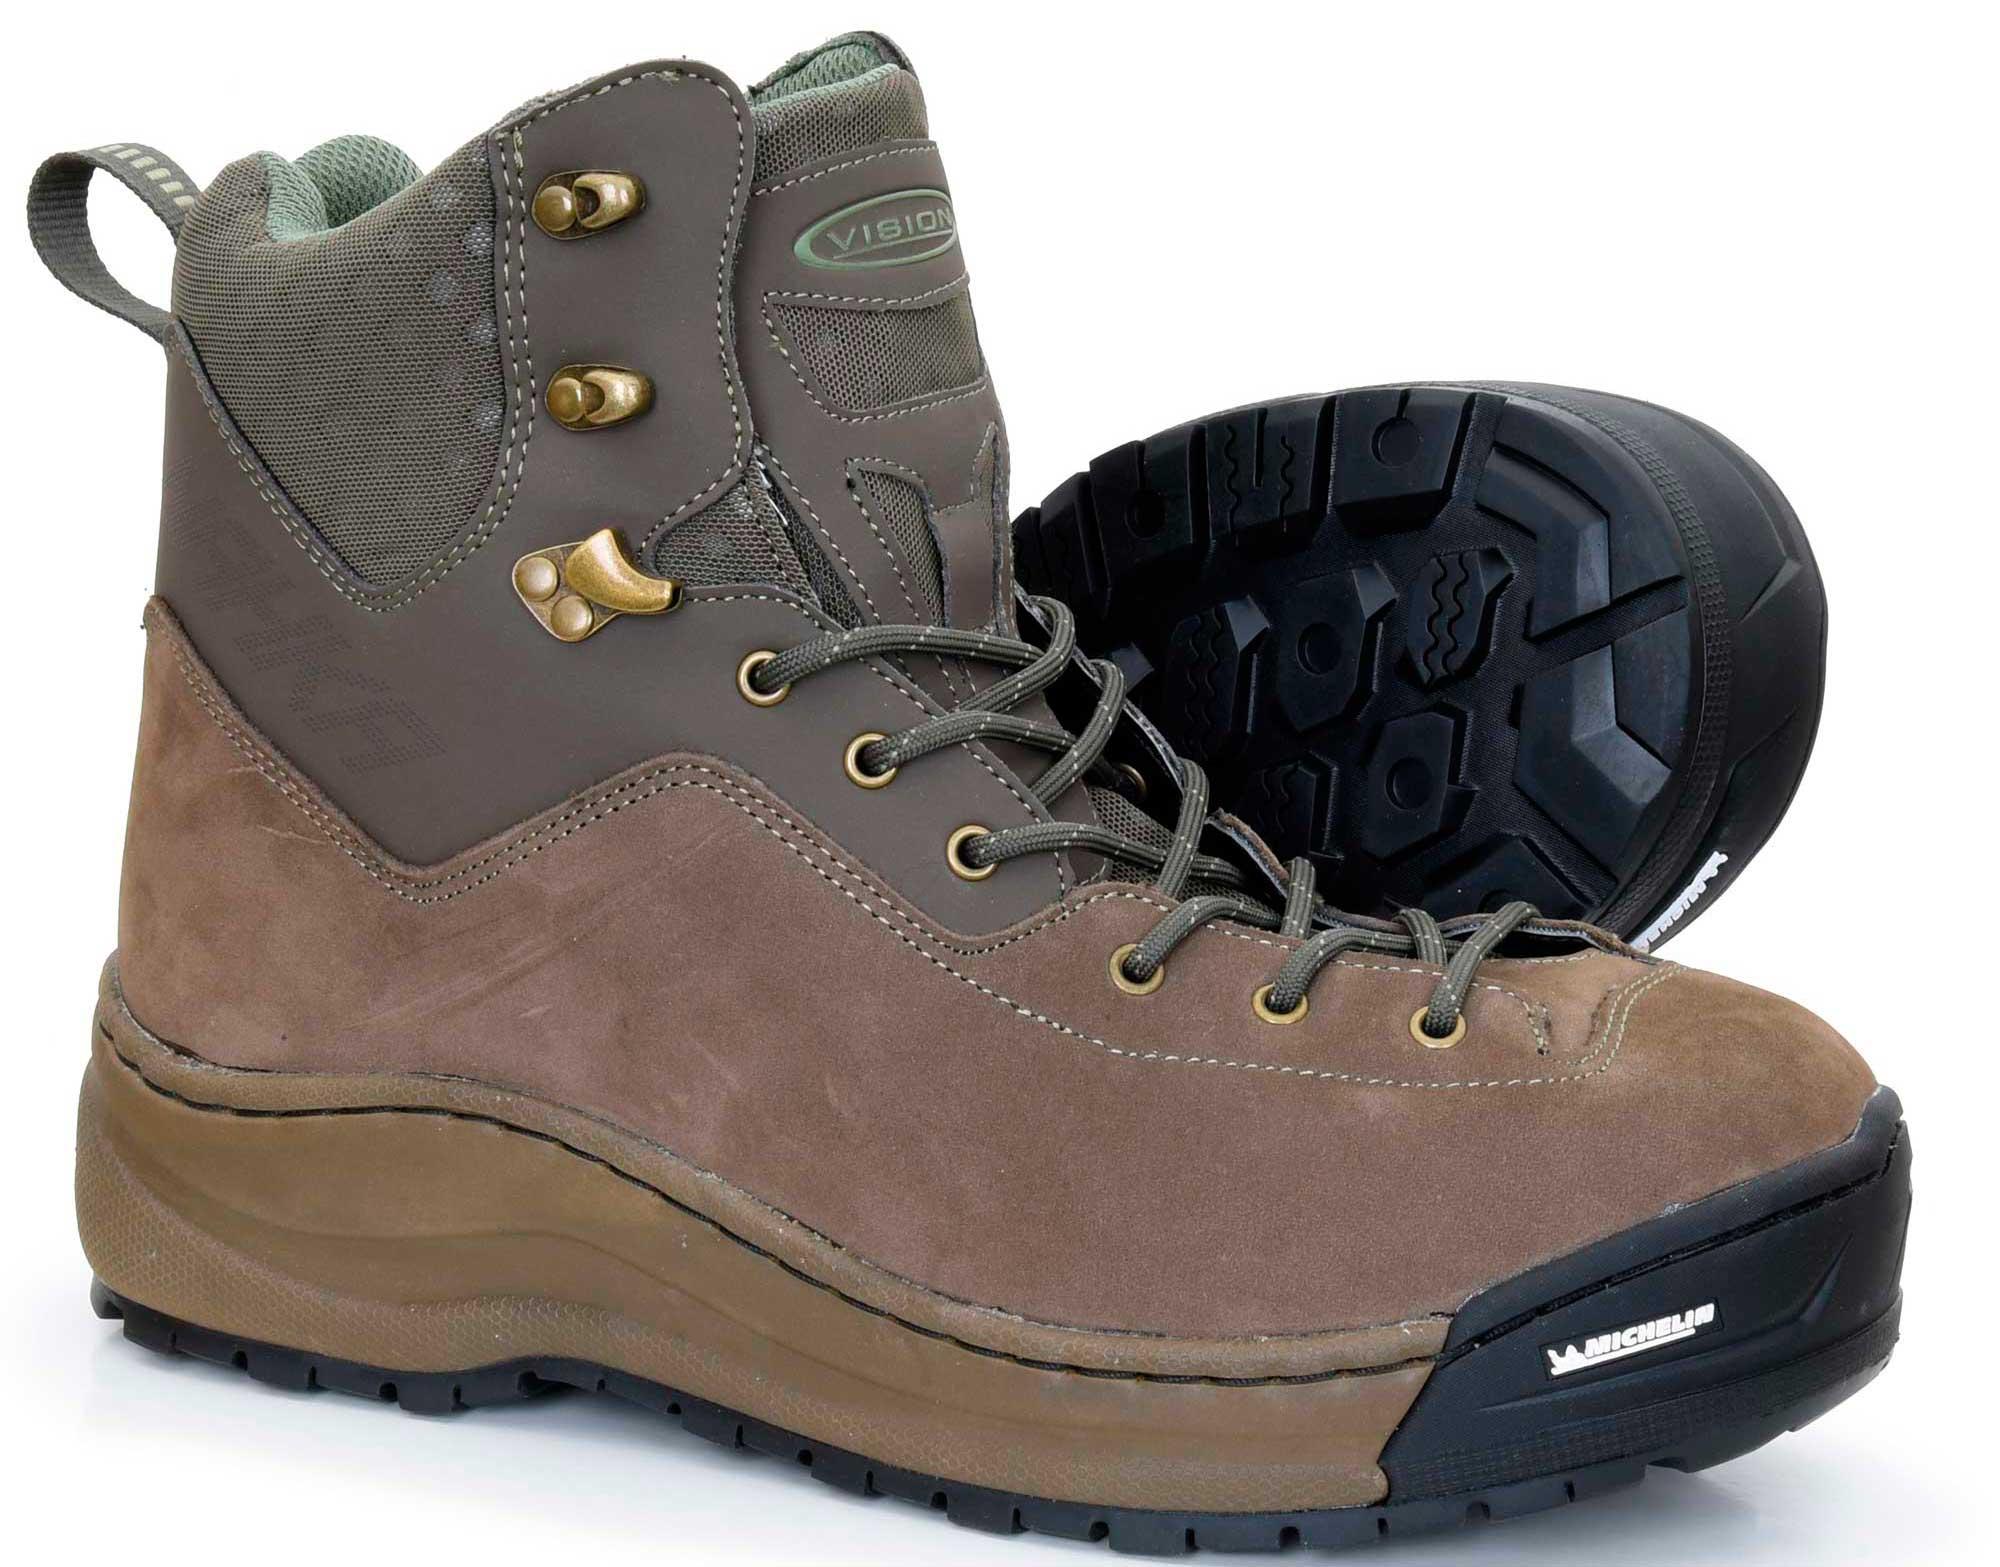 Botas-Vision-Nahka-Michelin-boots-2020